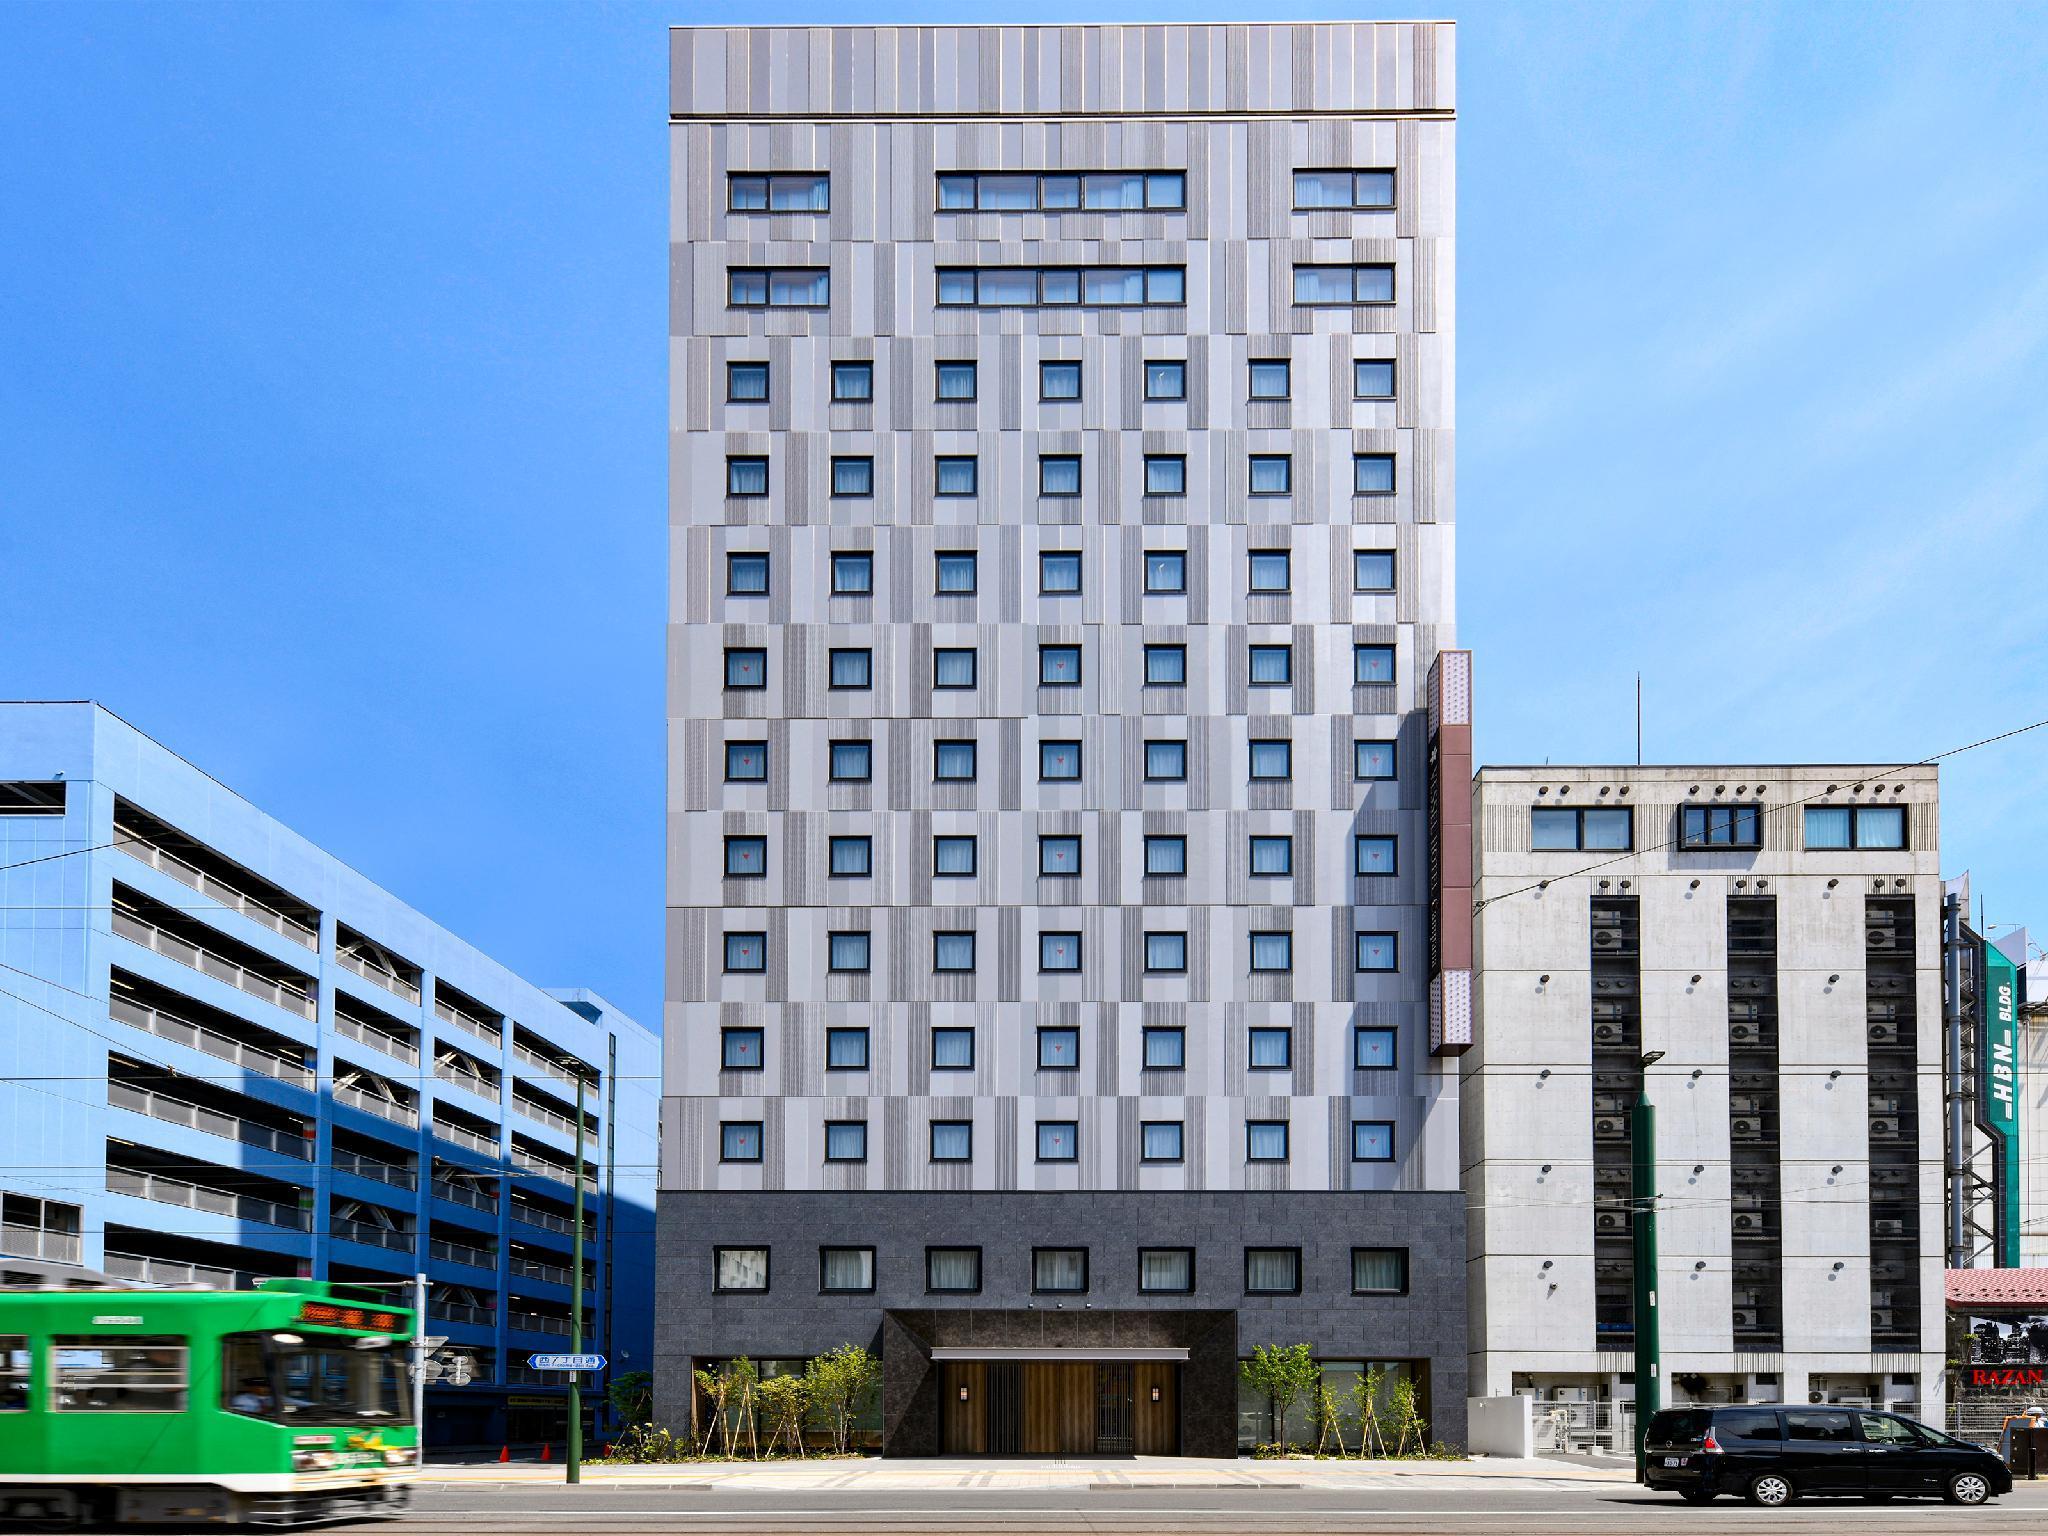 Vessel Hotel Campana Susukino